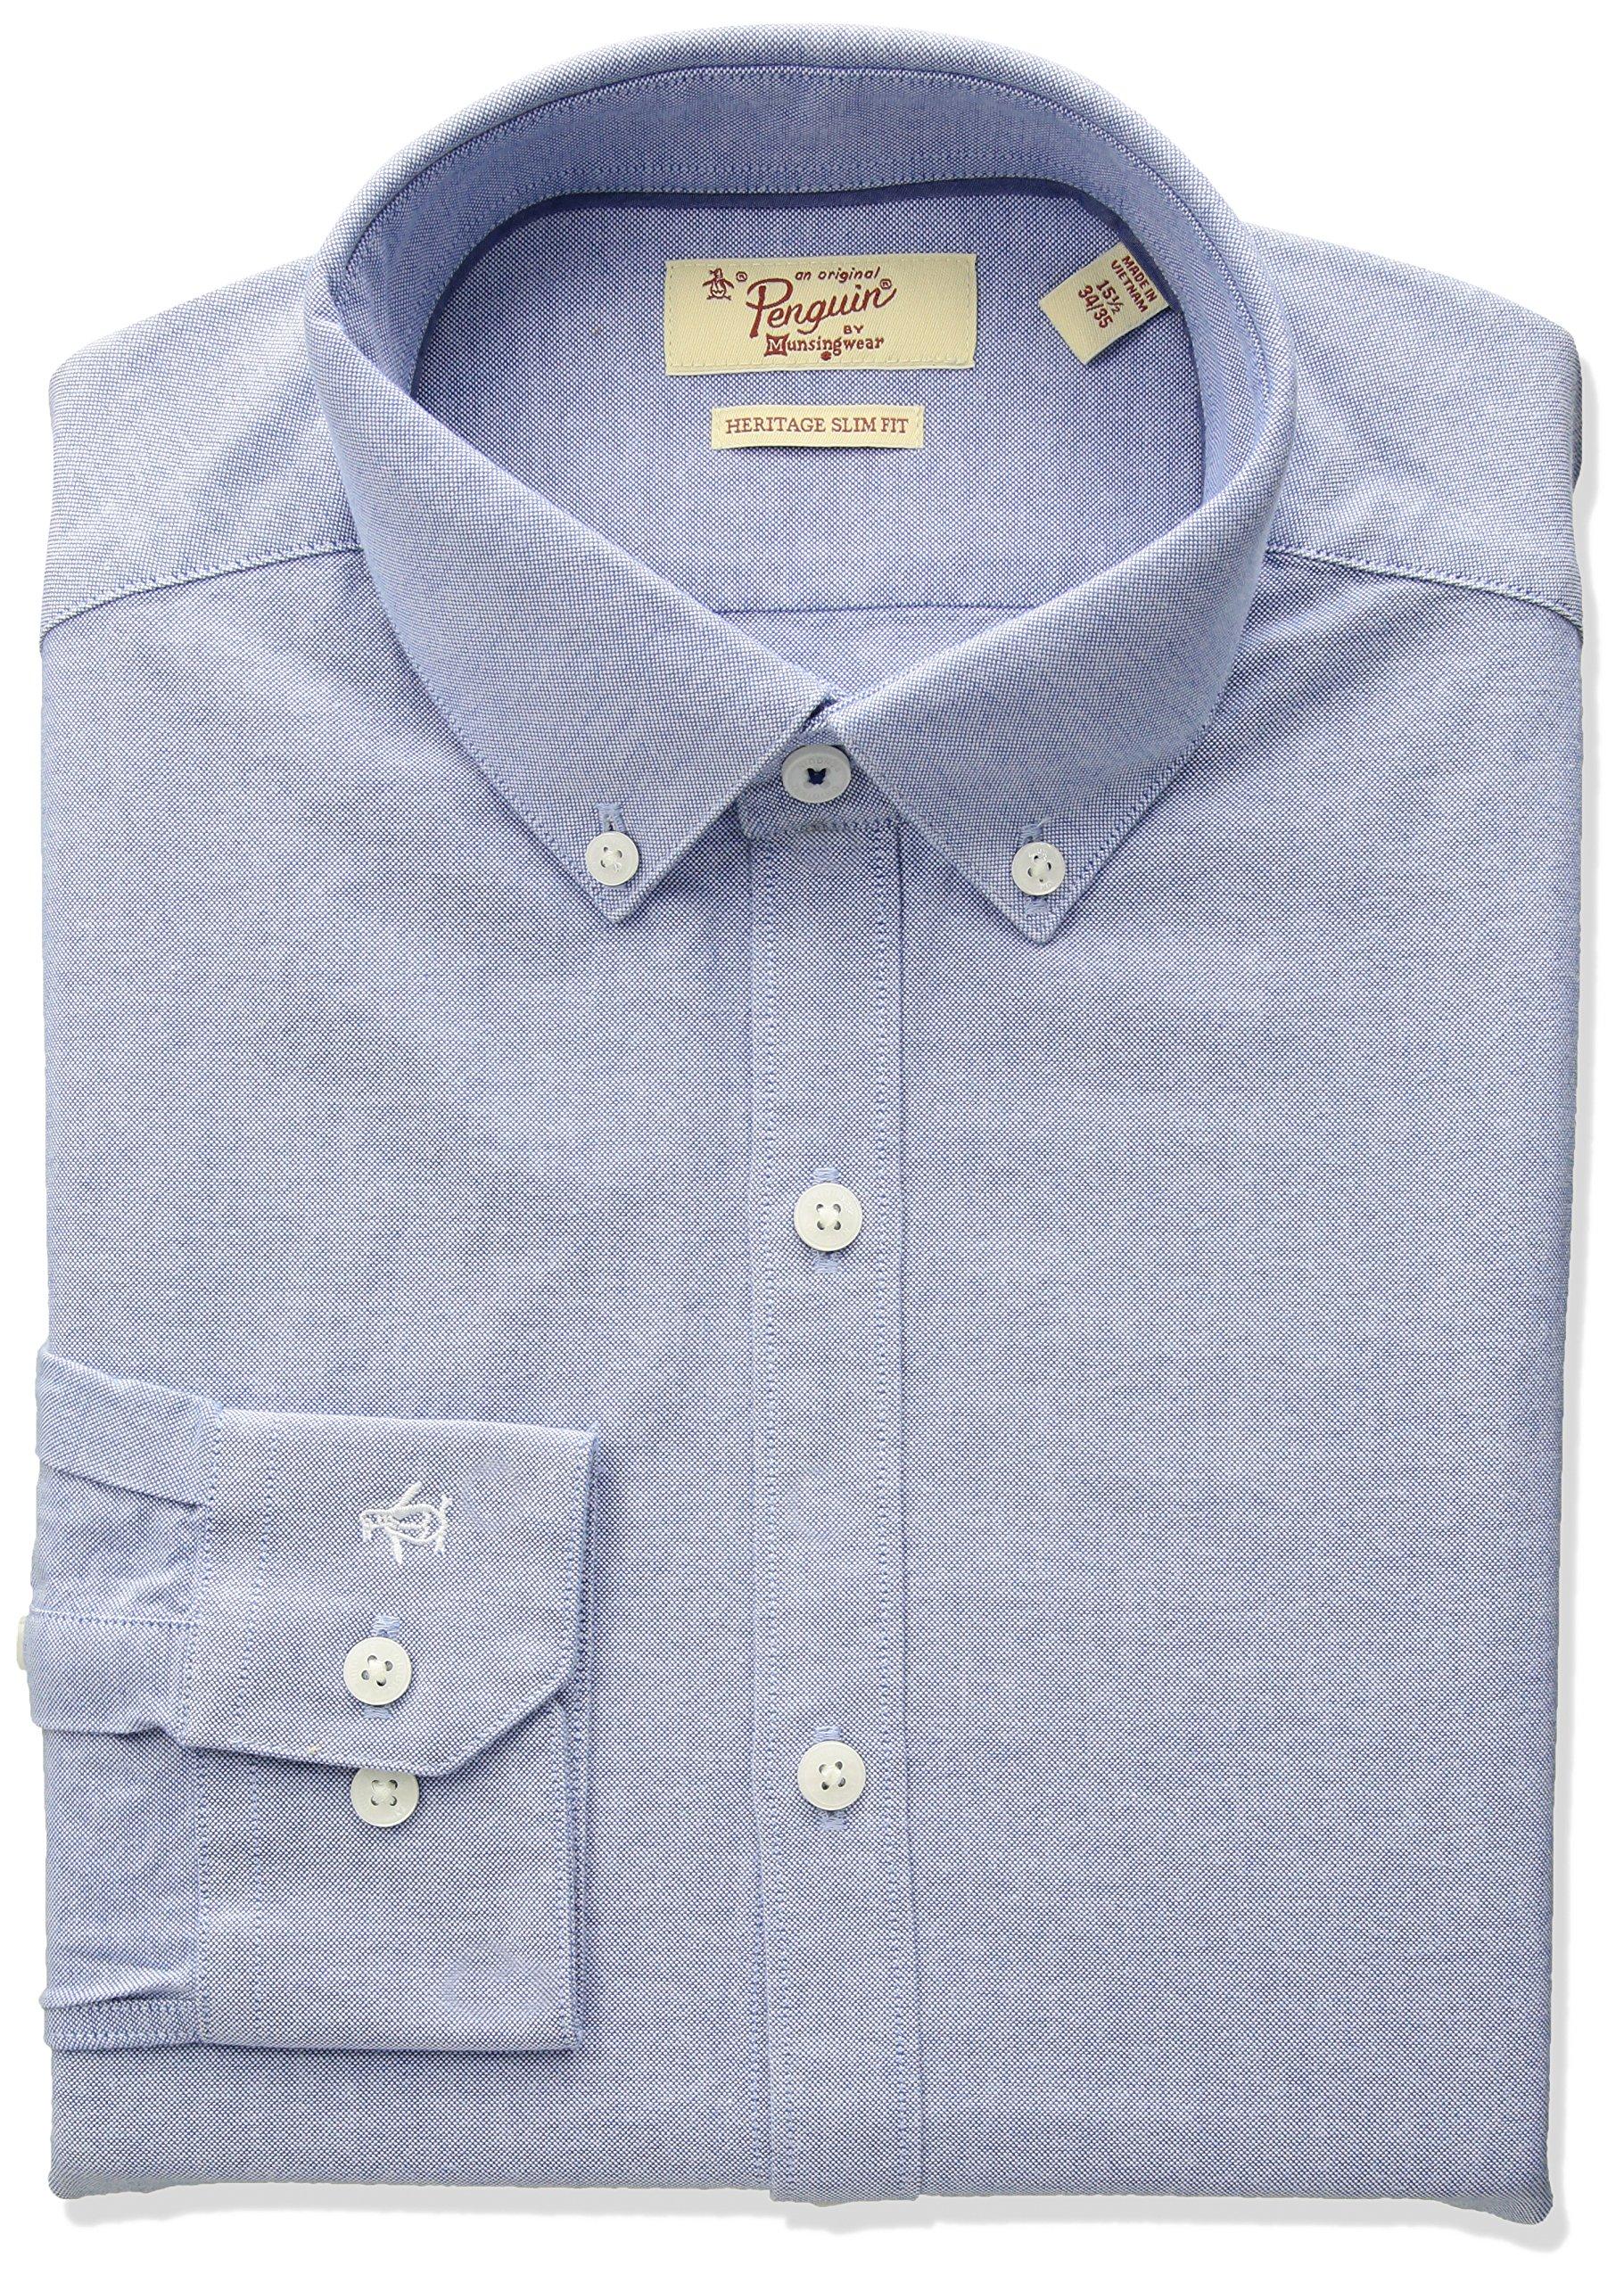 Original Penguin Men's Slim Fit Button Down Collar Oxford Dress Shirt, Blue, 17.5 36/37